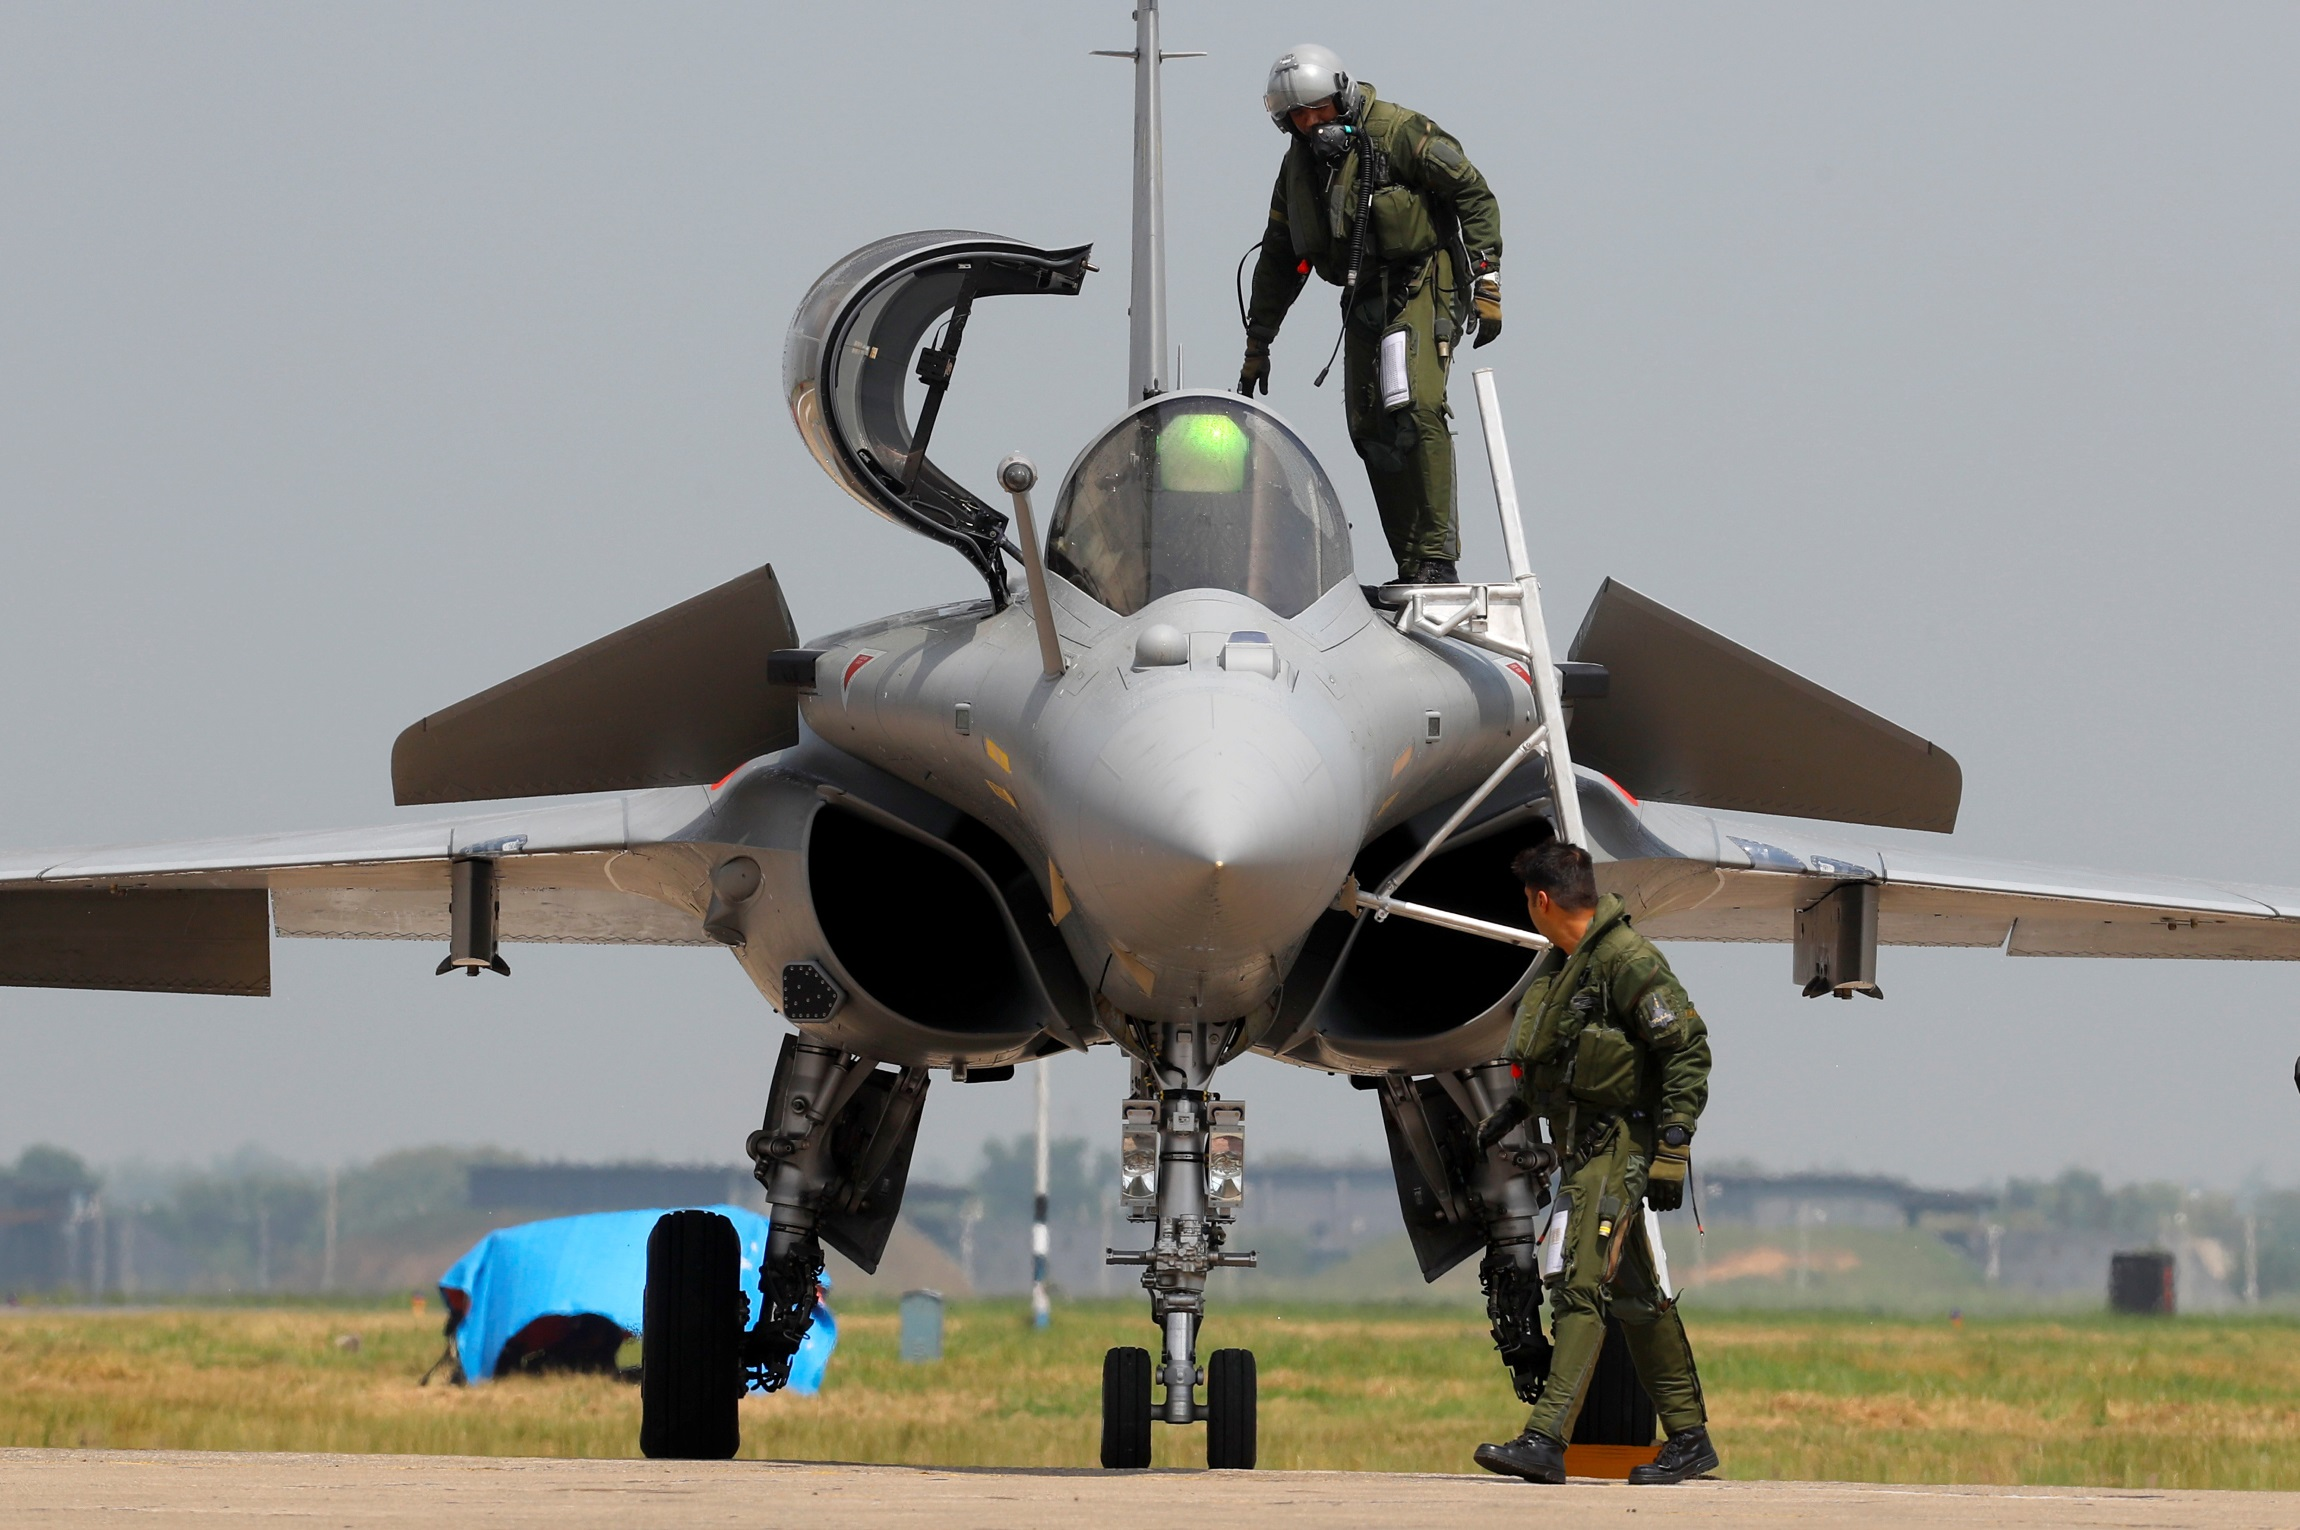 Rafale: Η ώρα της Βουλής – Προς έγκριση η συμφωνία για την αγορά των Γαλλικών μαχητικών